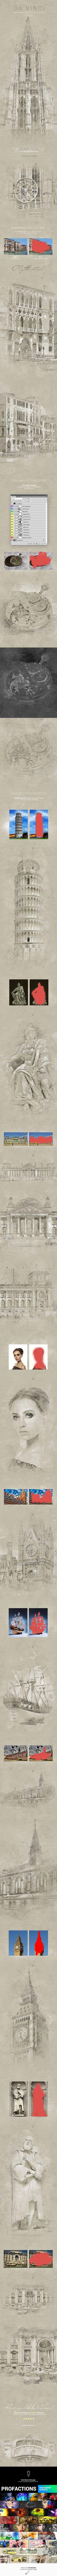 Da Vinci - Hand Drawn Sketch Photoshop Action - Photo Effects Actions